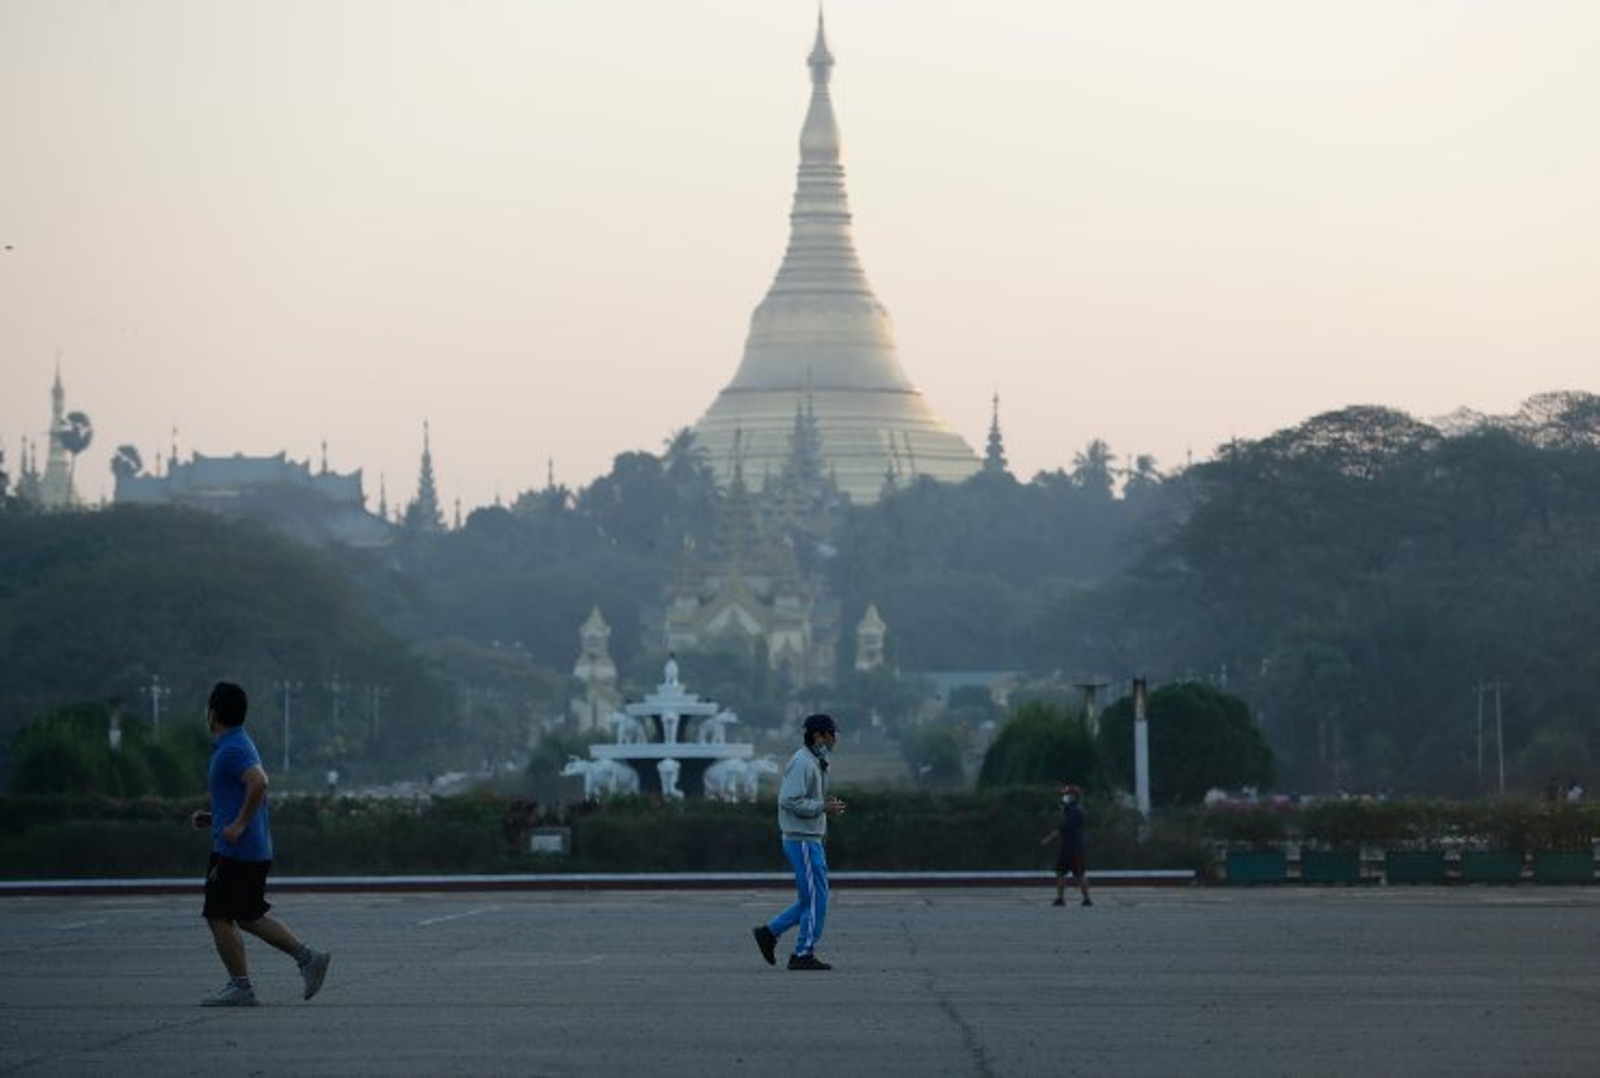 People take exercises at people park near holy Shwedagon pagoda in Yangon, Myanmar, 01 February 2021. EPA